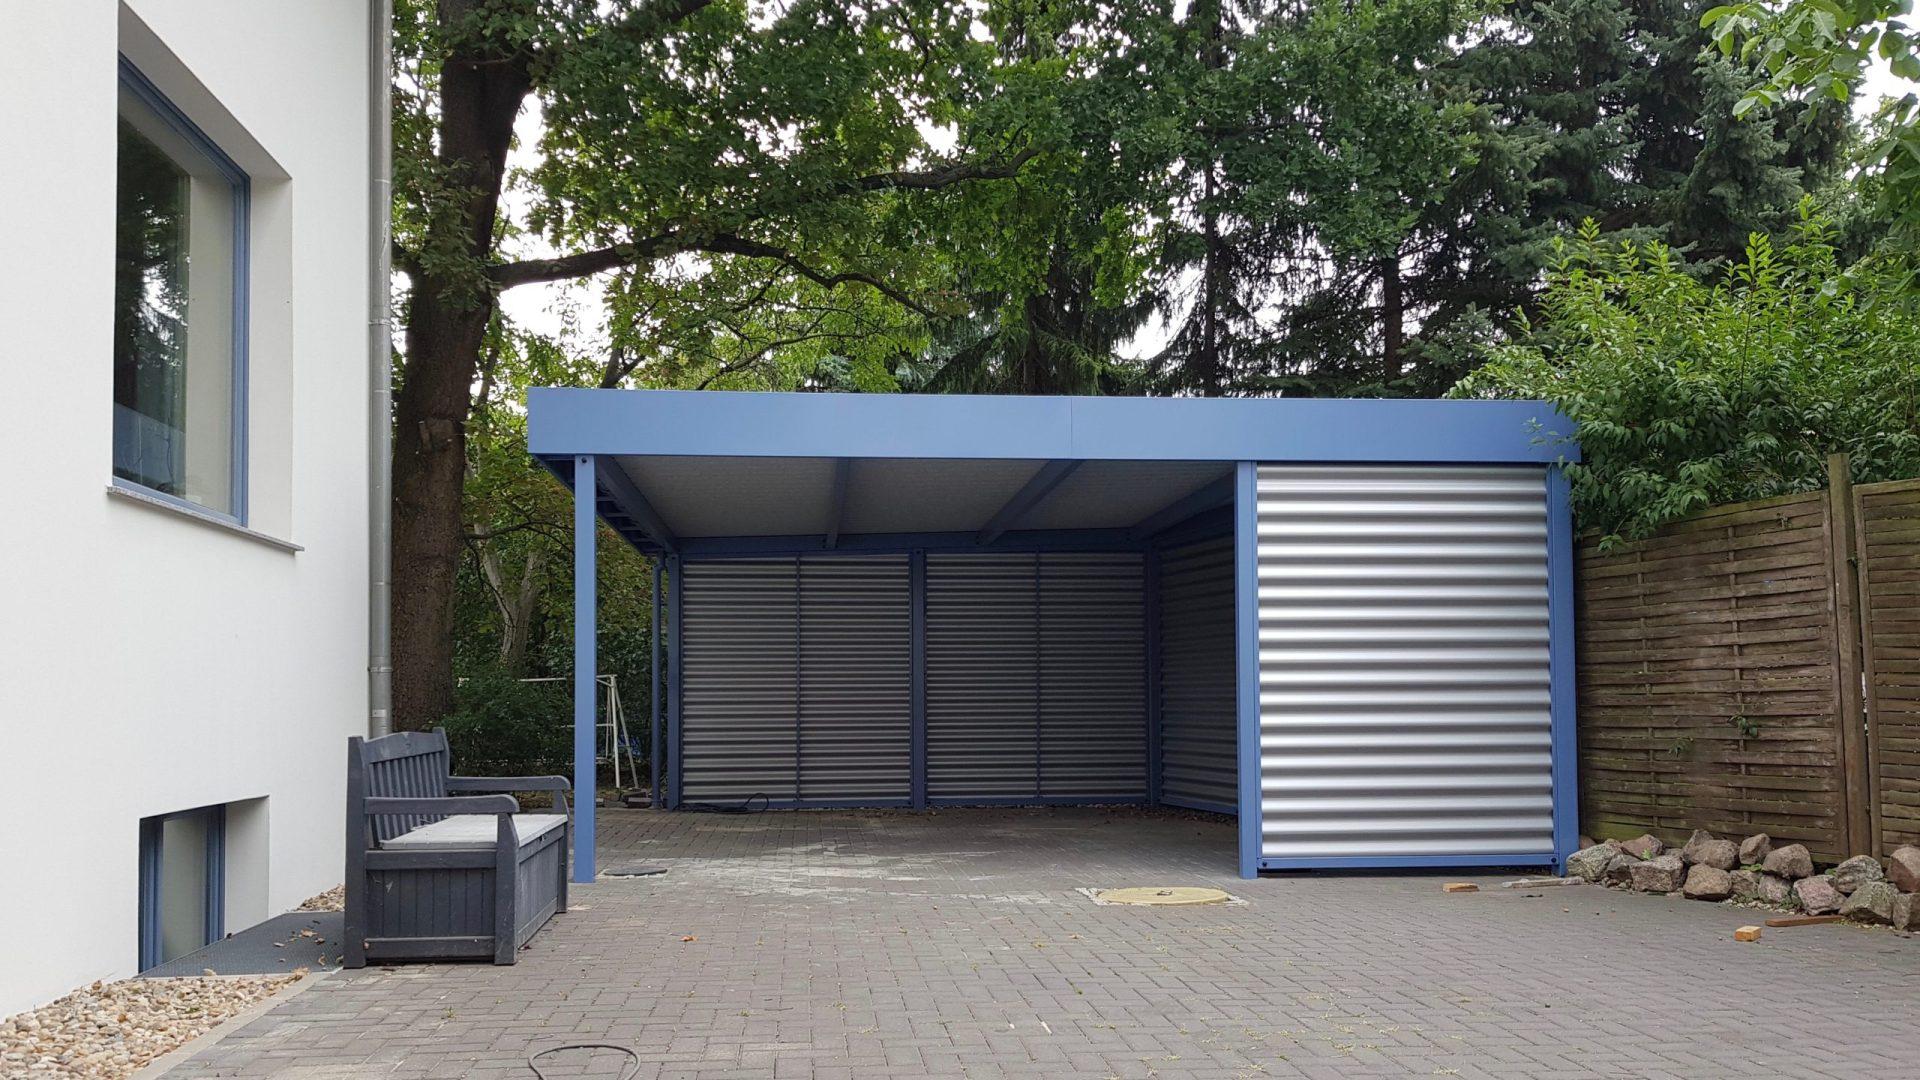 Carport Einzelcarport - Carportmaster Projekt 19-F-2377 - 13156 Berlin - Carportbild 01